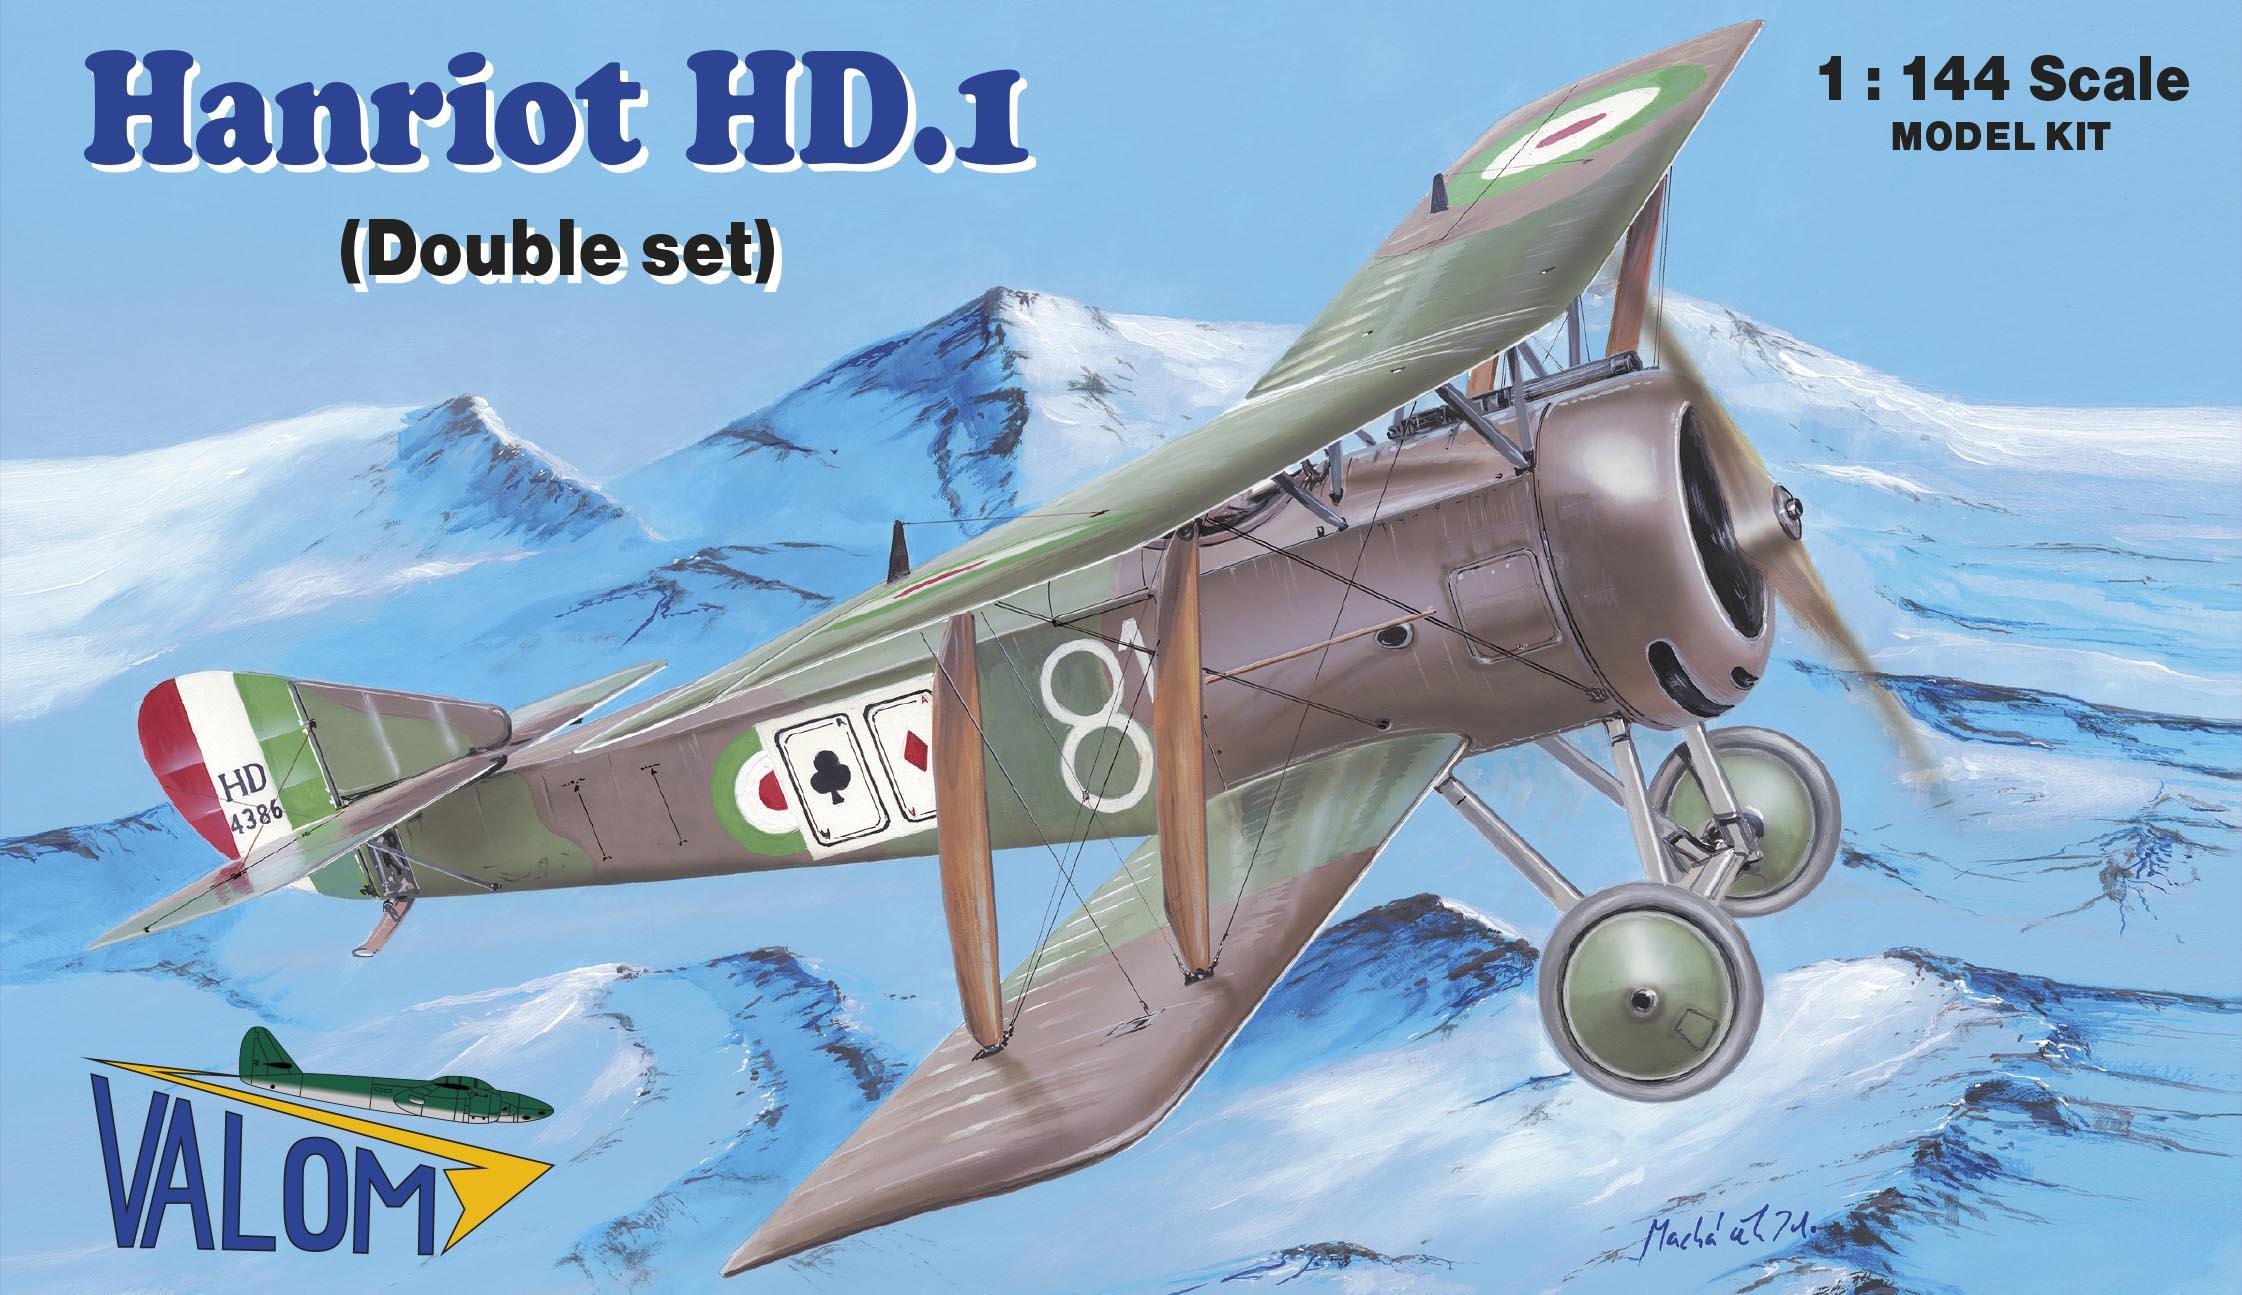 Valom Hanriot HD.1 (double set)